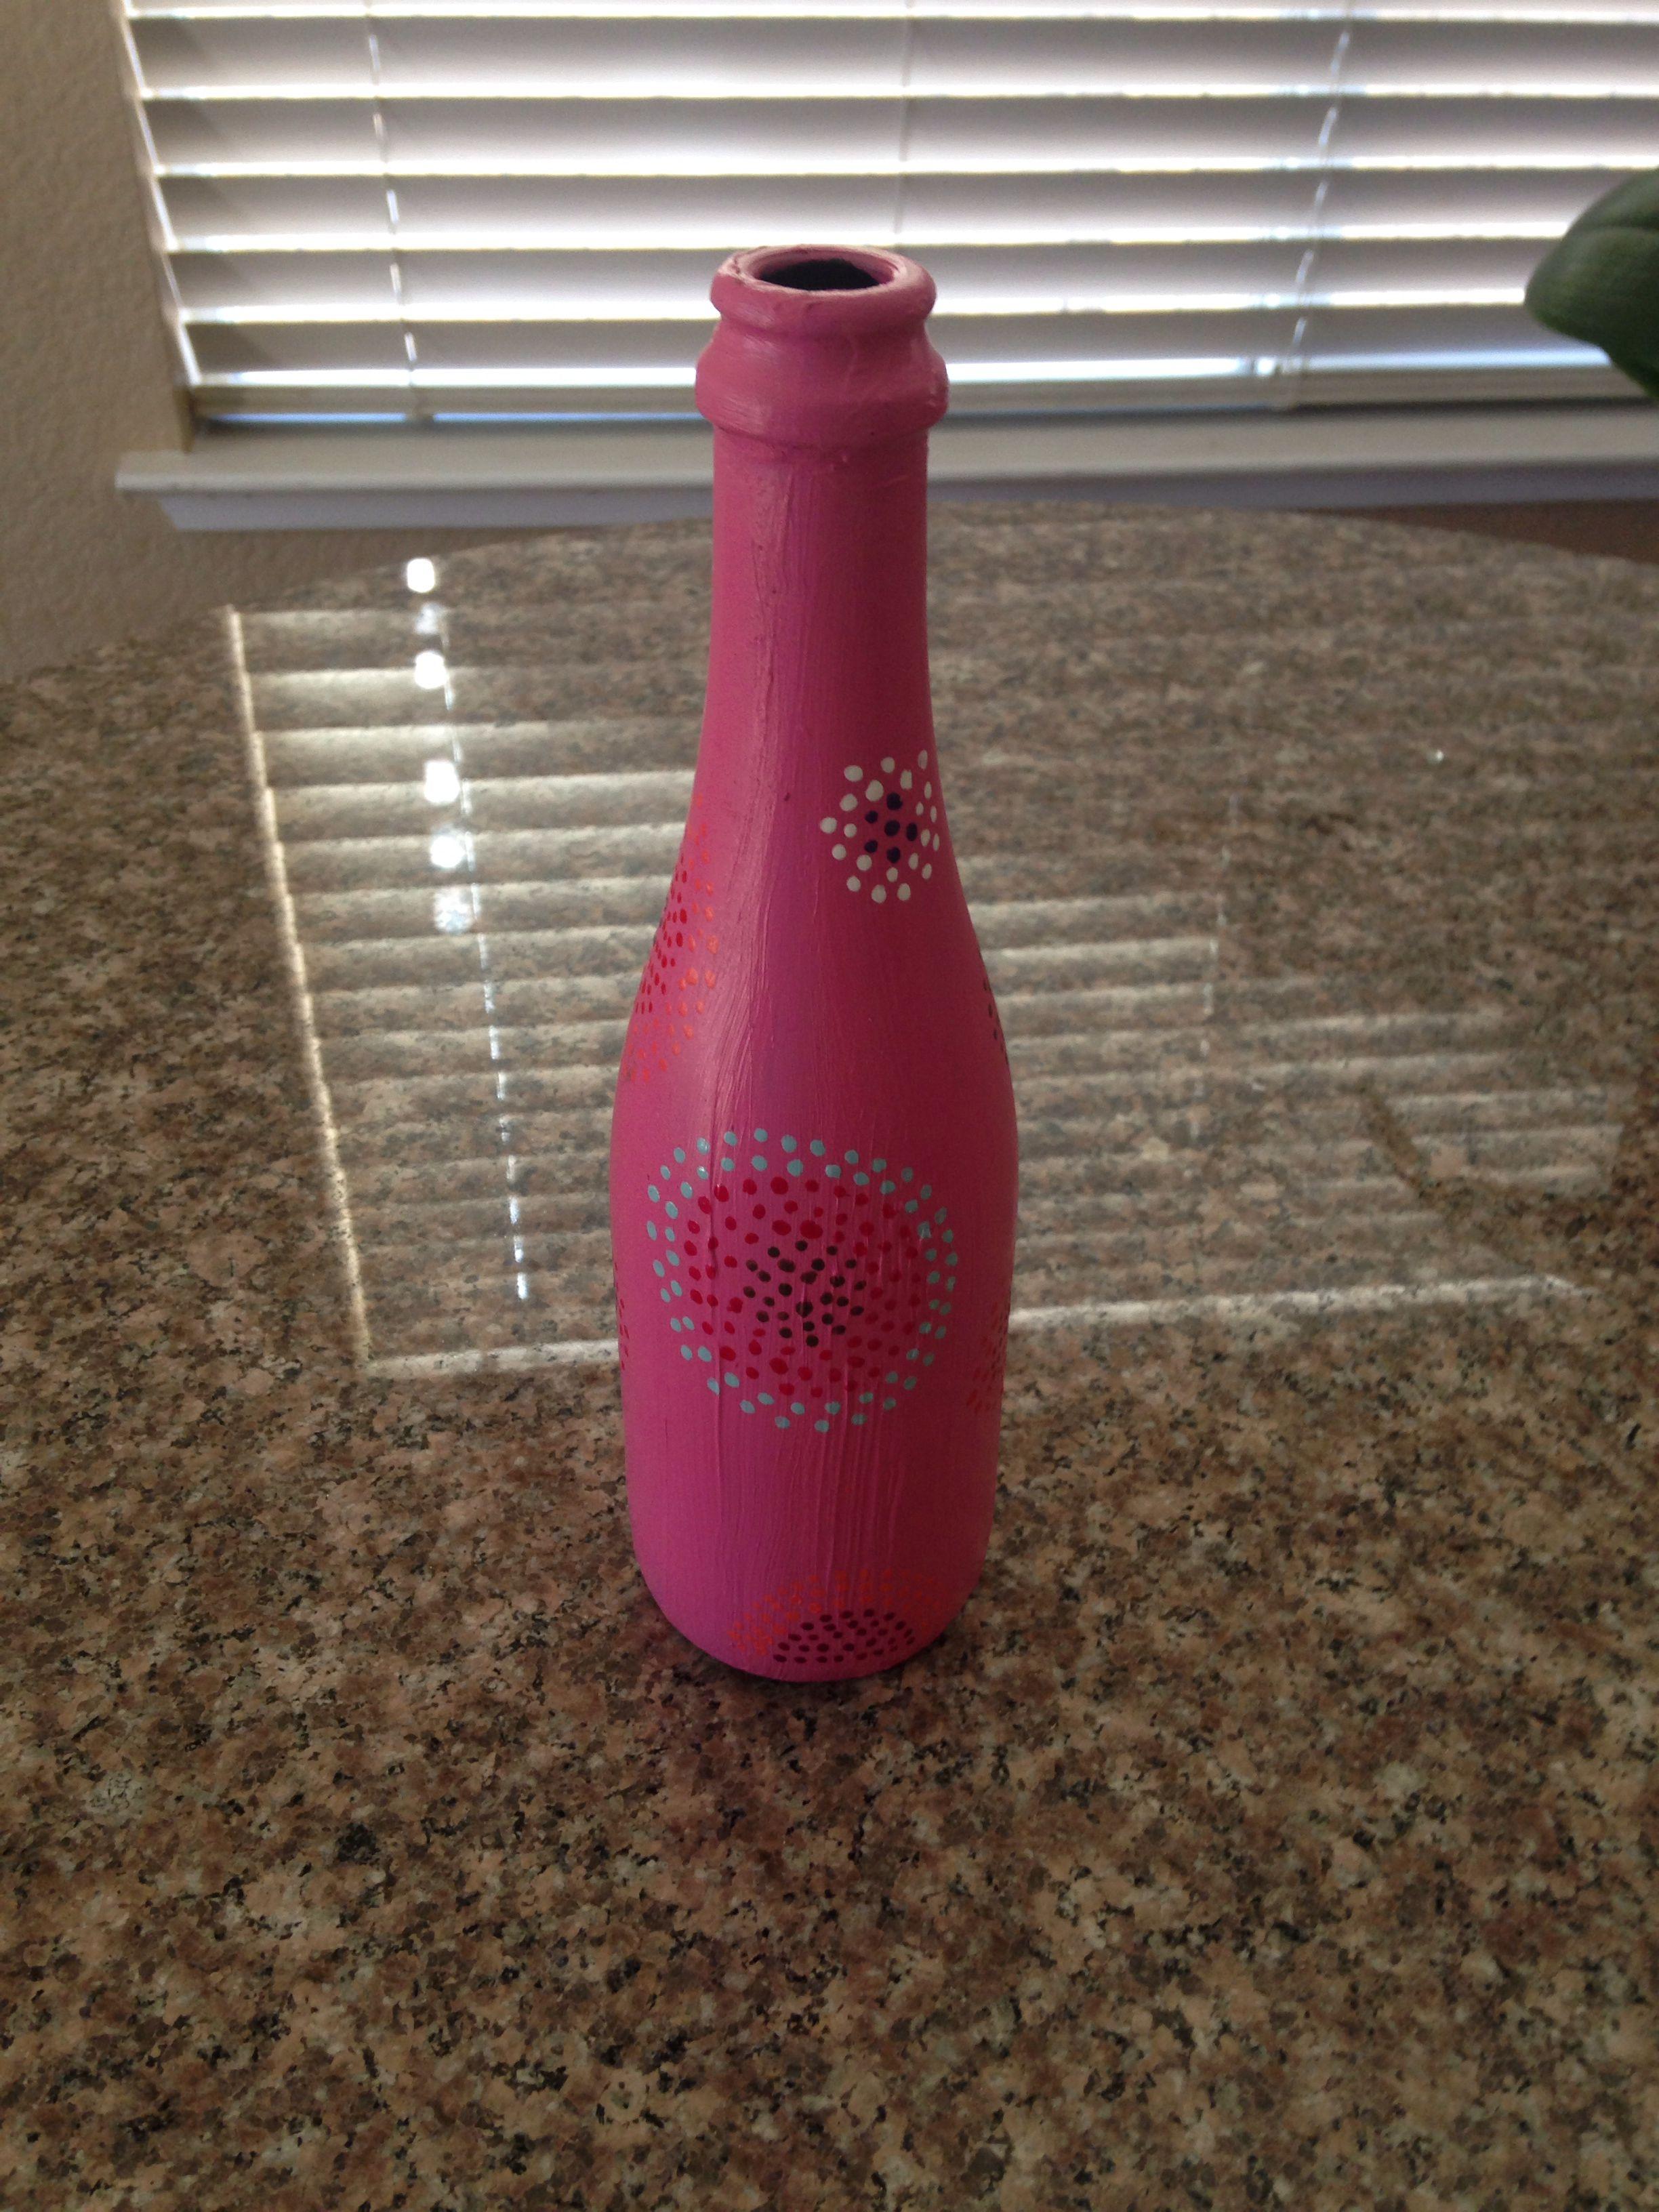 Diy Wine Bottle Vase Great For Big Little Week Sorority Crafts Wine Bottle Diy Wine Bottle Vases Diy Wine